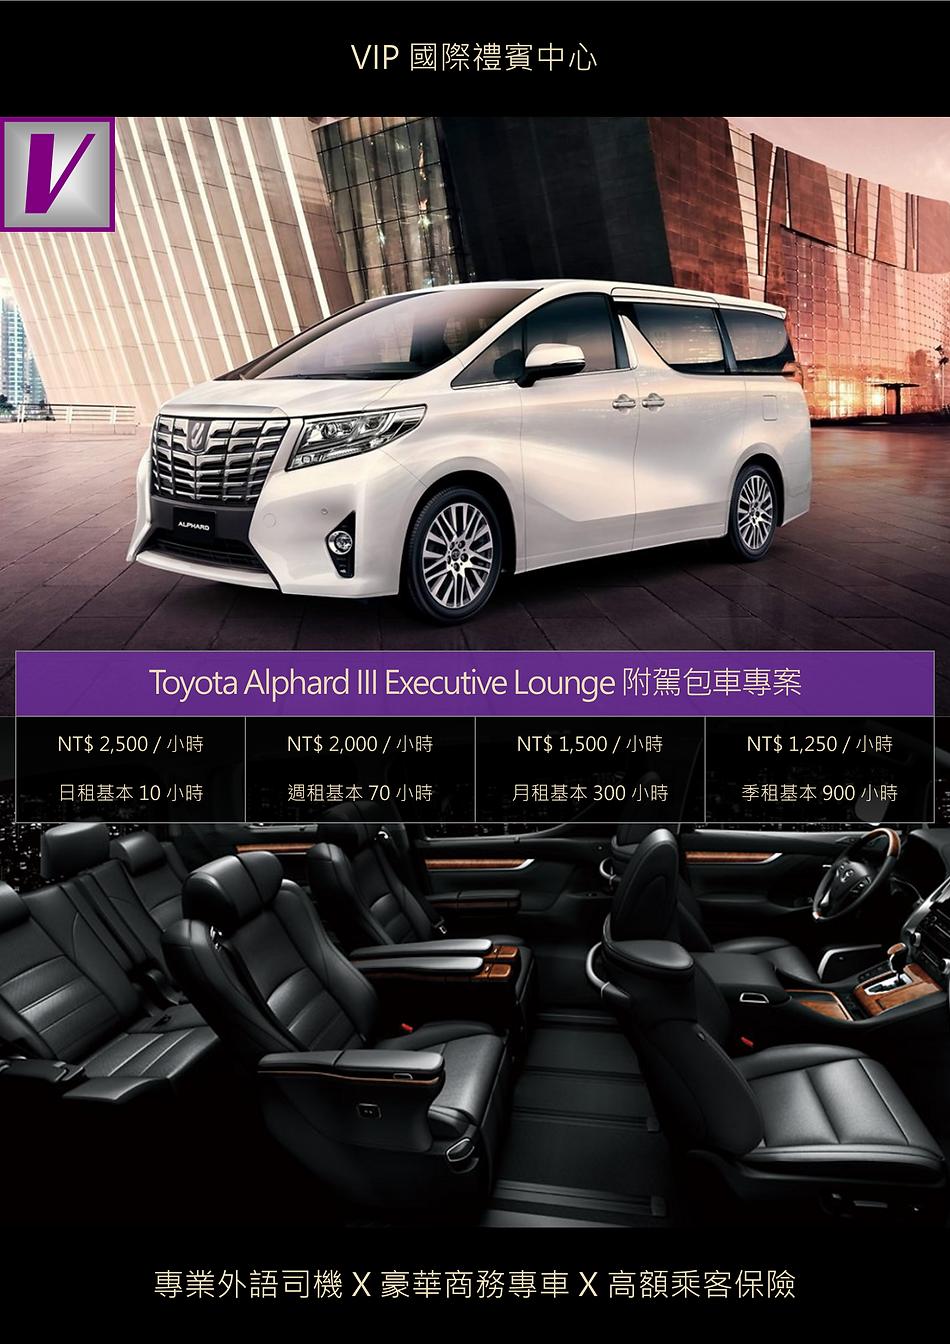 VIP國際禮賓中心 TOYOTA ALPHARD III EXECUTIVE LOUNGE 附駕包車專案 DM.png